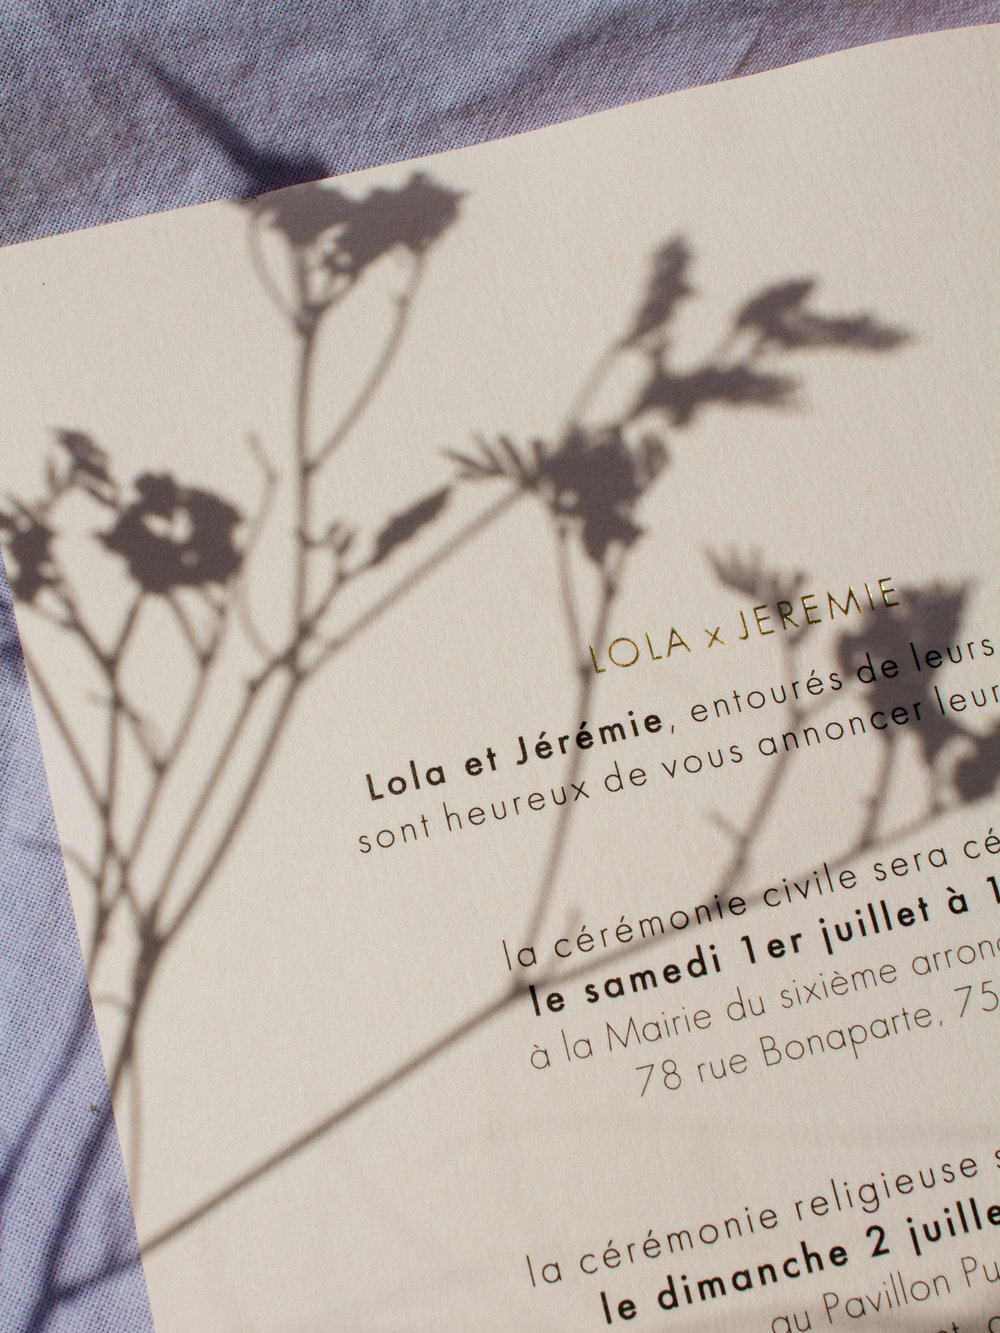 tomàs-avinent-invitations-84-Modifier.jpg